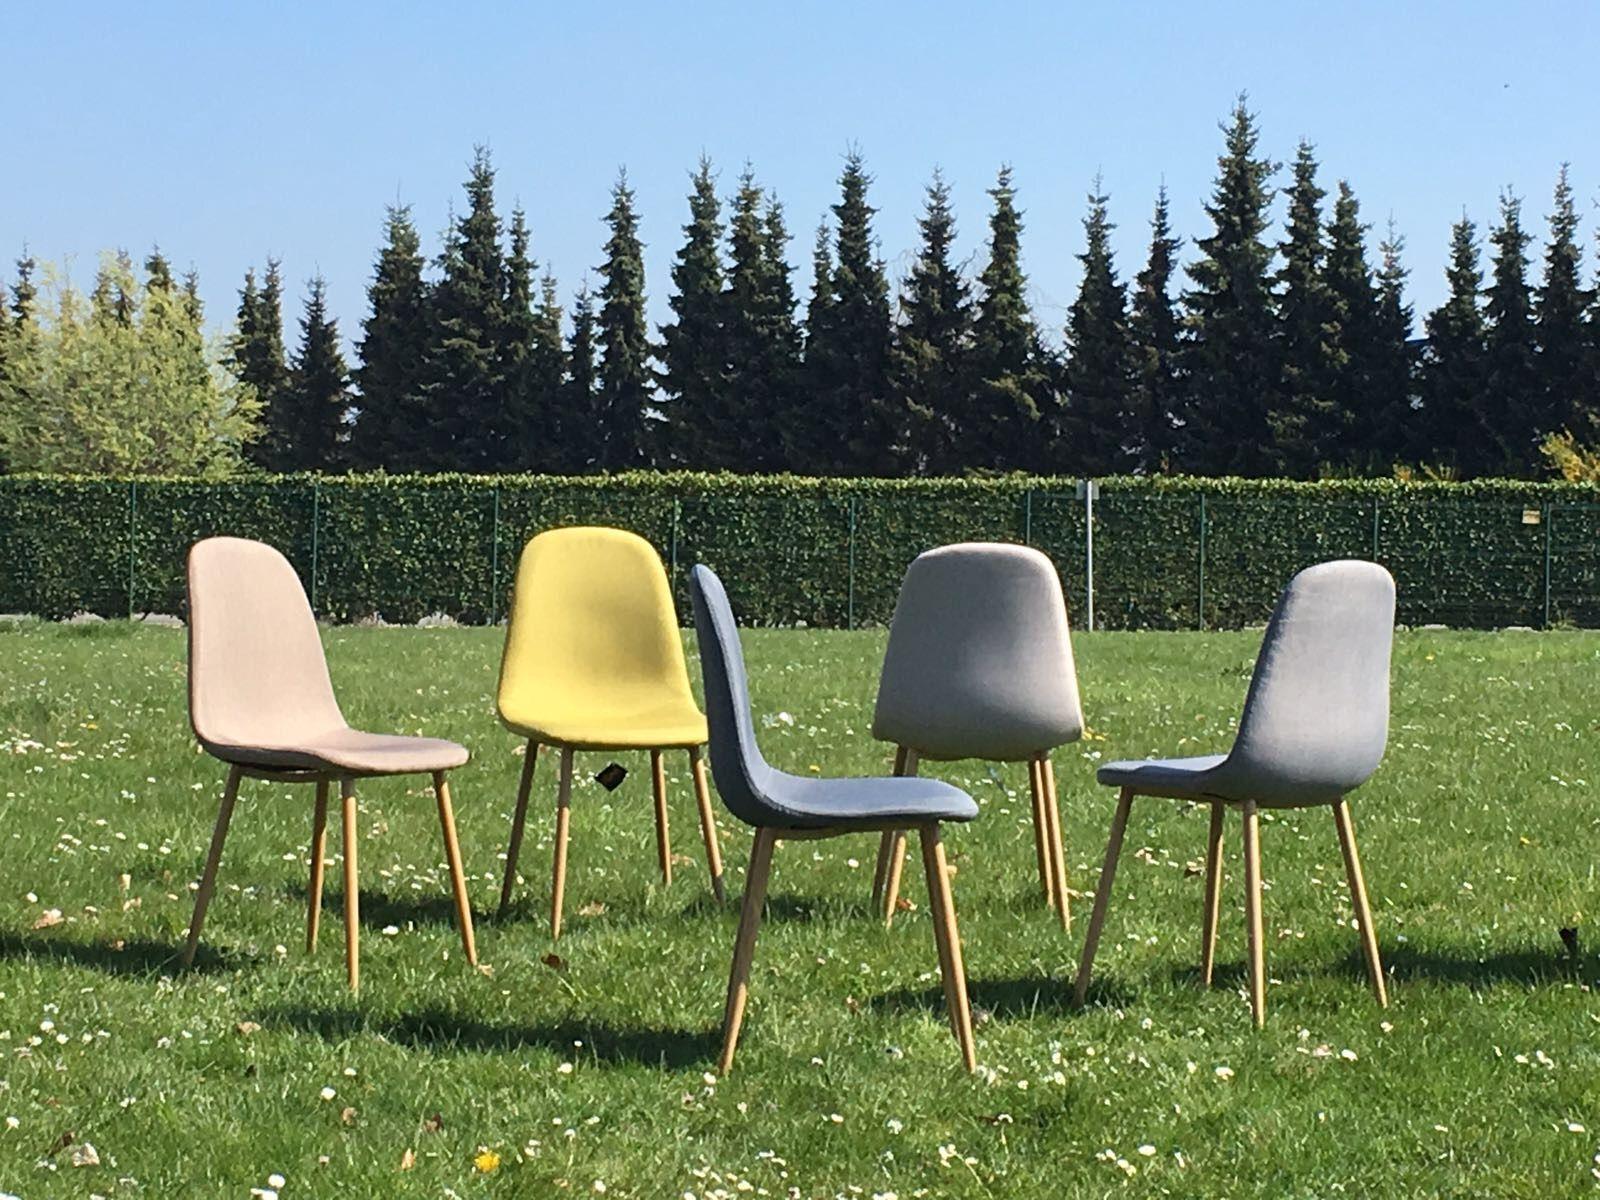 zonsChaise Chaise design scandinaveChaise et scandinave hQsCxdtr